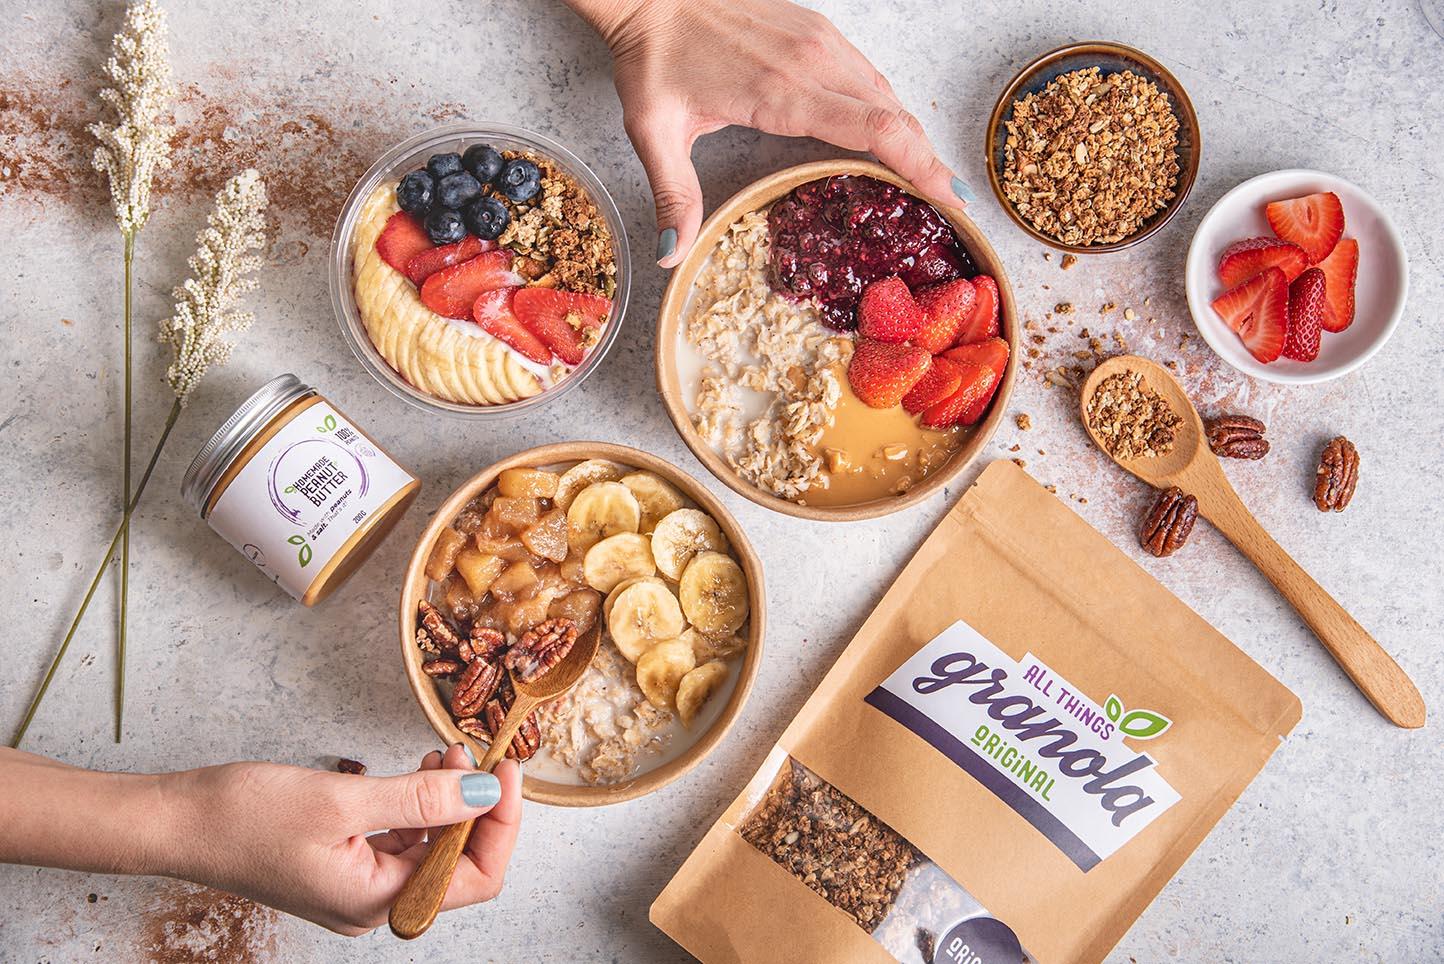 all-things-granola-label-branding-packaging-dubai-2